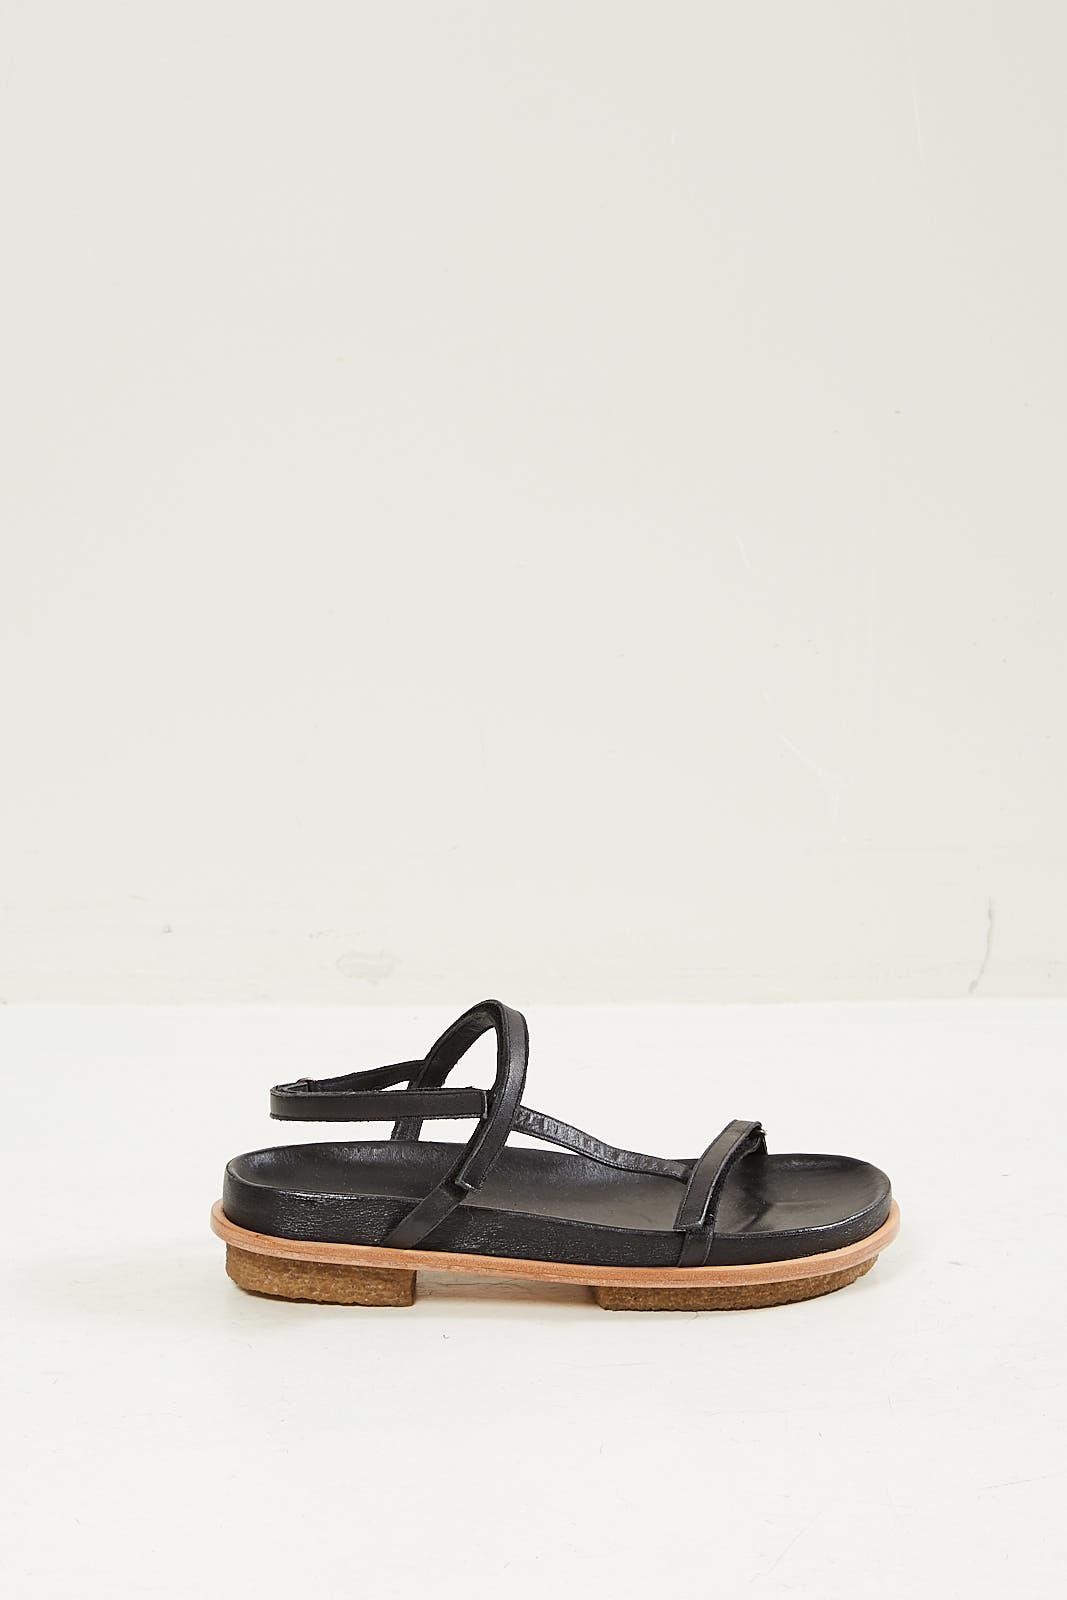 Mari Giudicelli - Isabel sandal